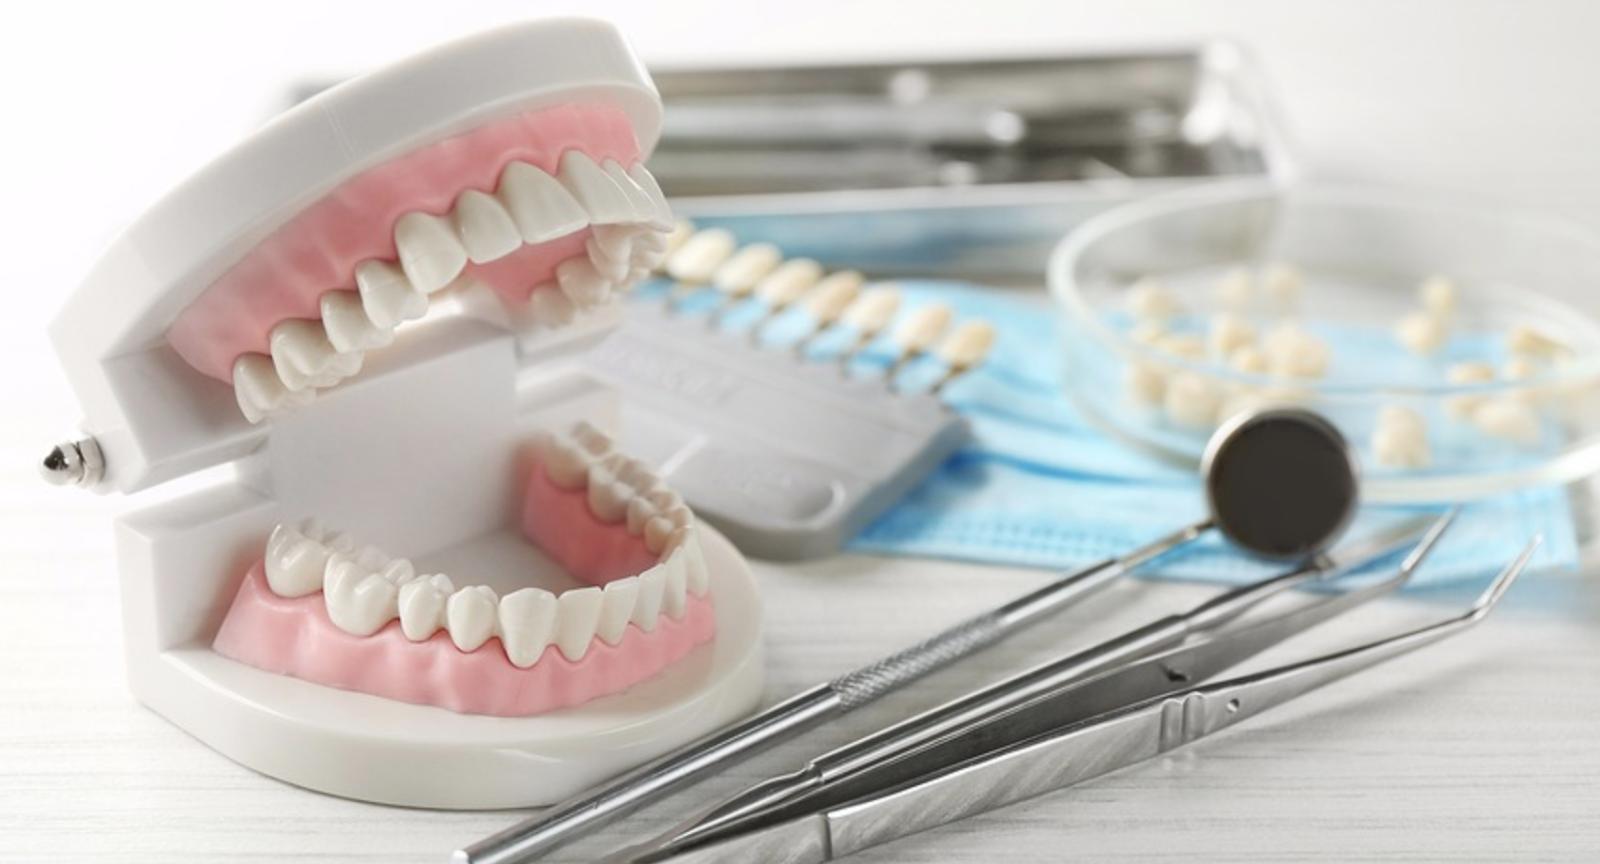 Idaho Dentist Accused of Abandoning Patients